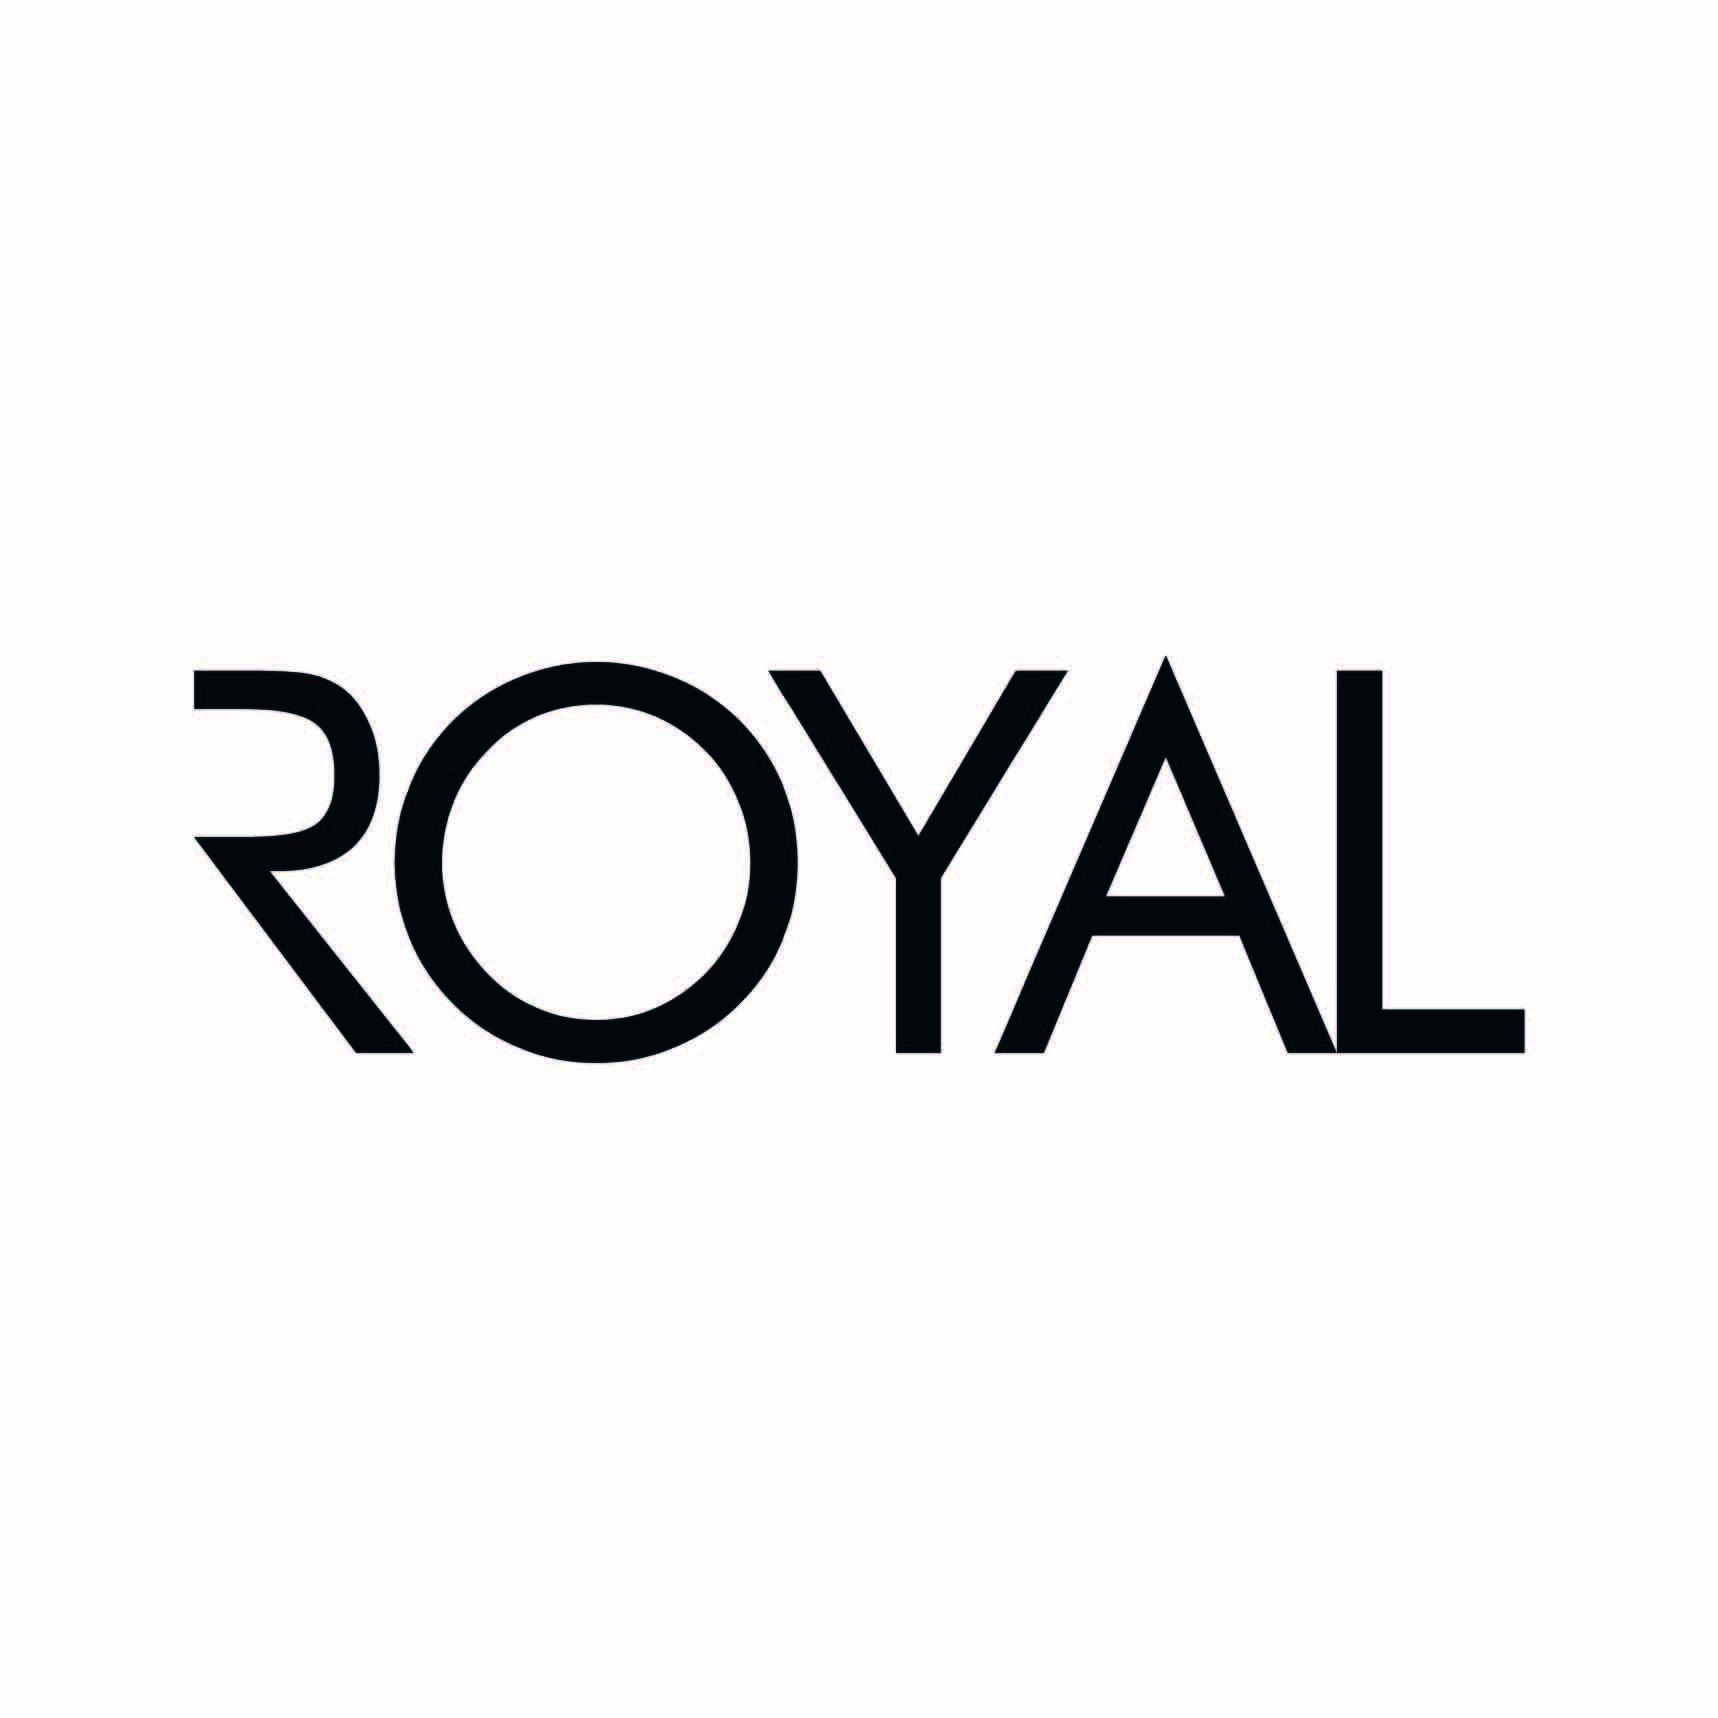 Royal Wedding 萝亚注册送28体验金的游戏平台